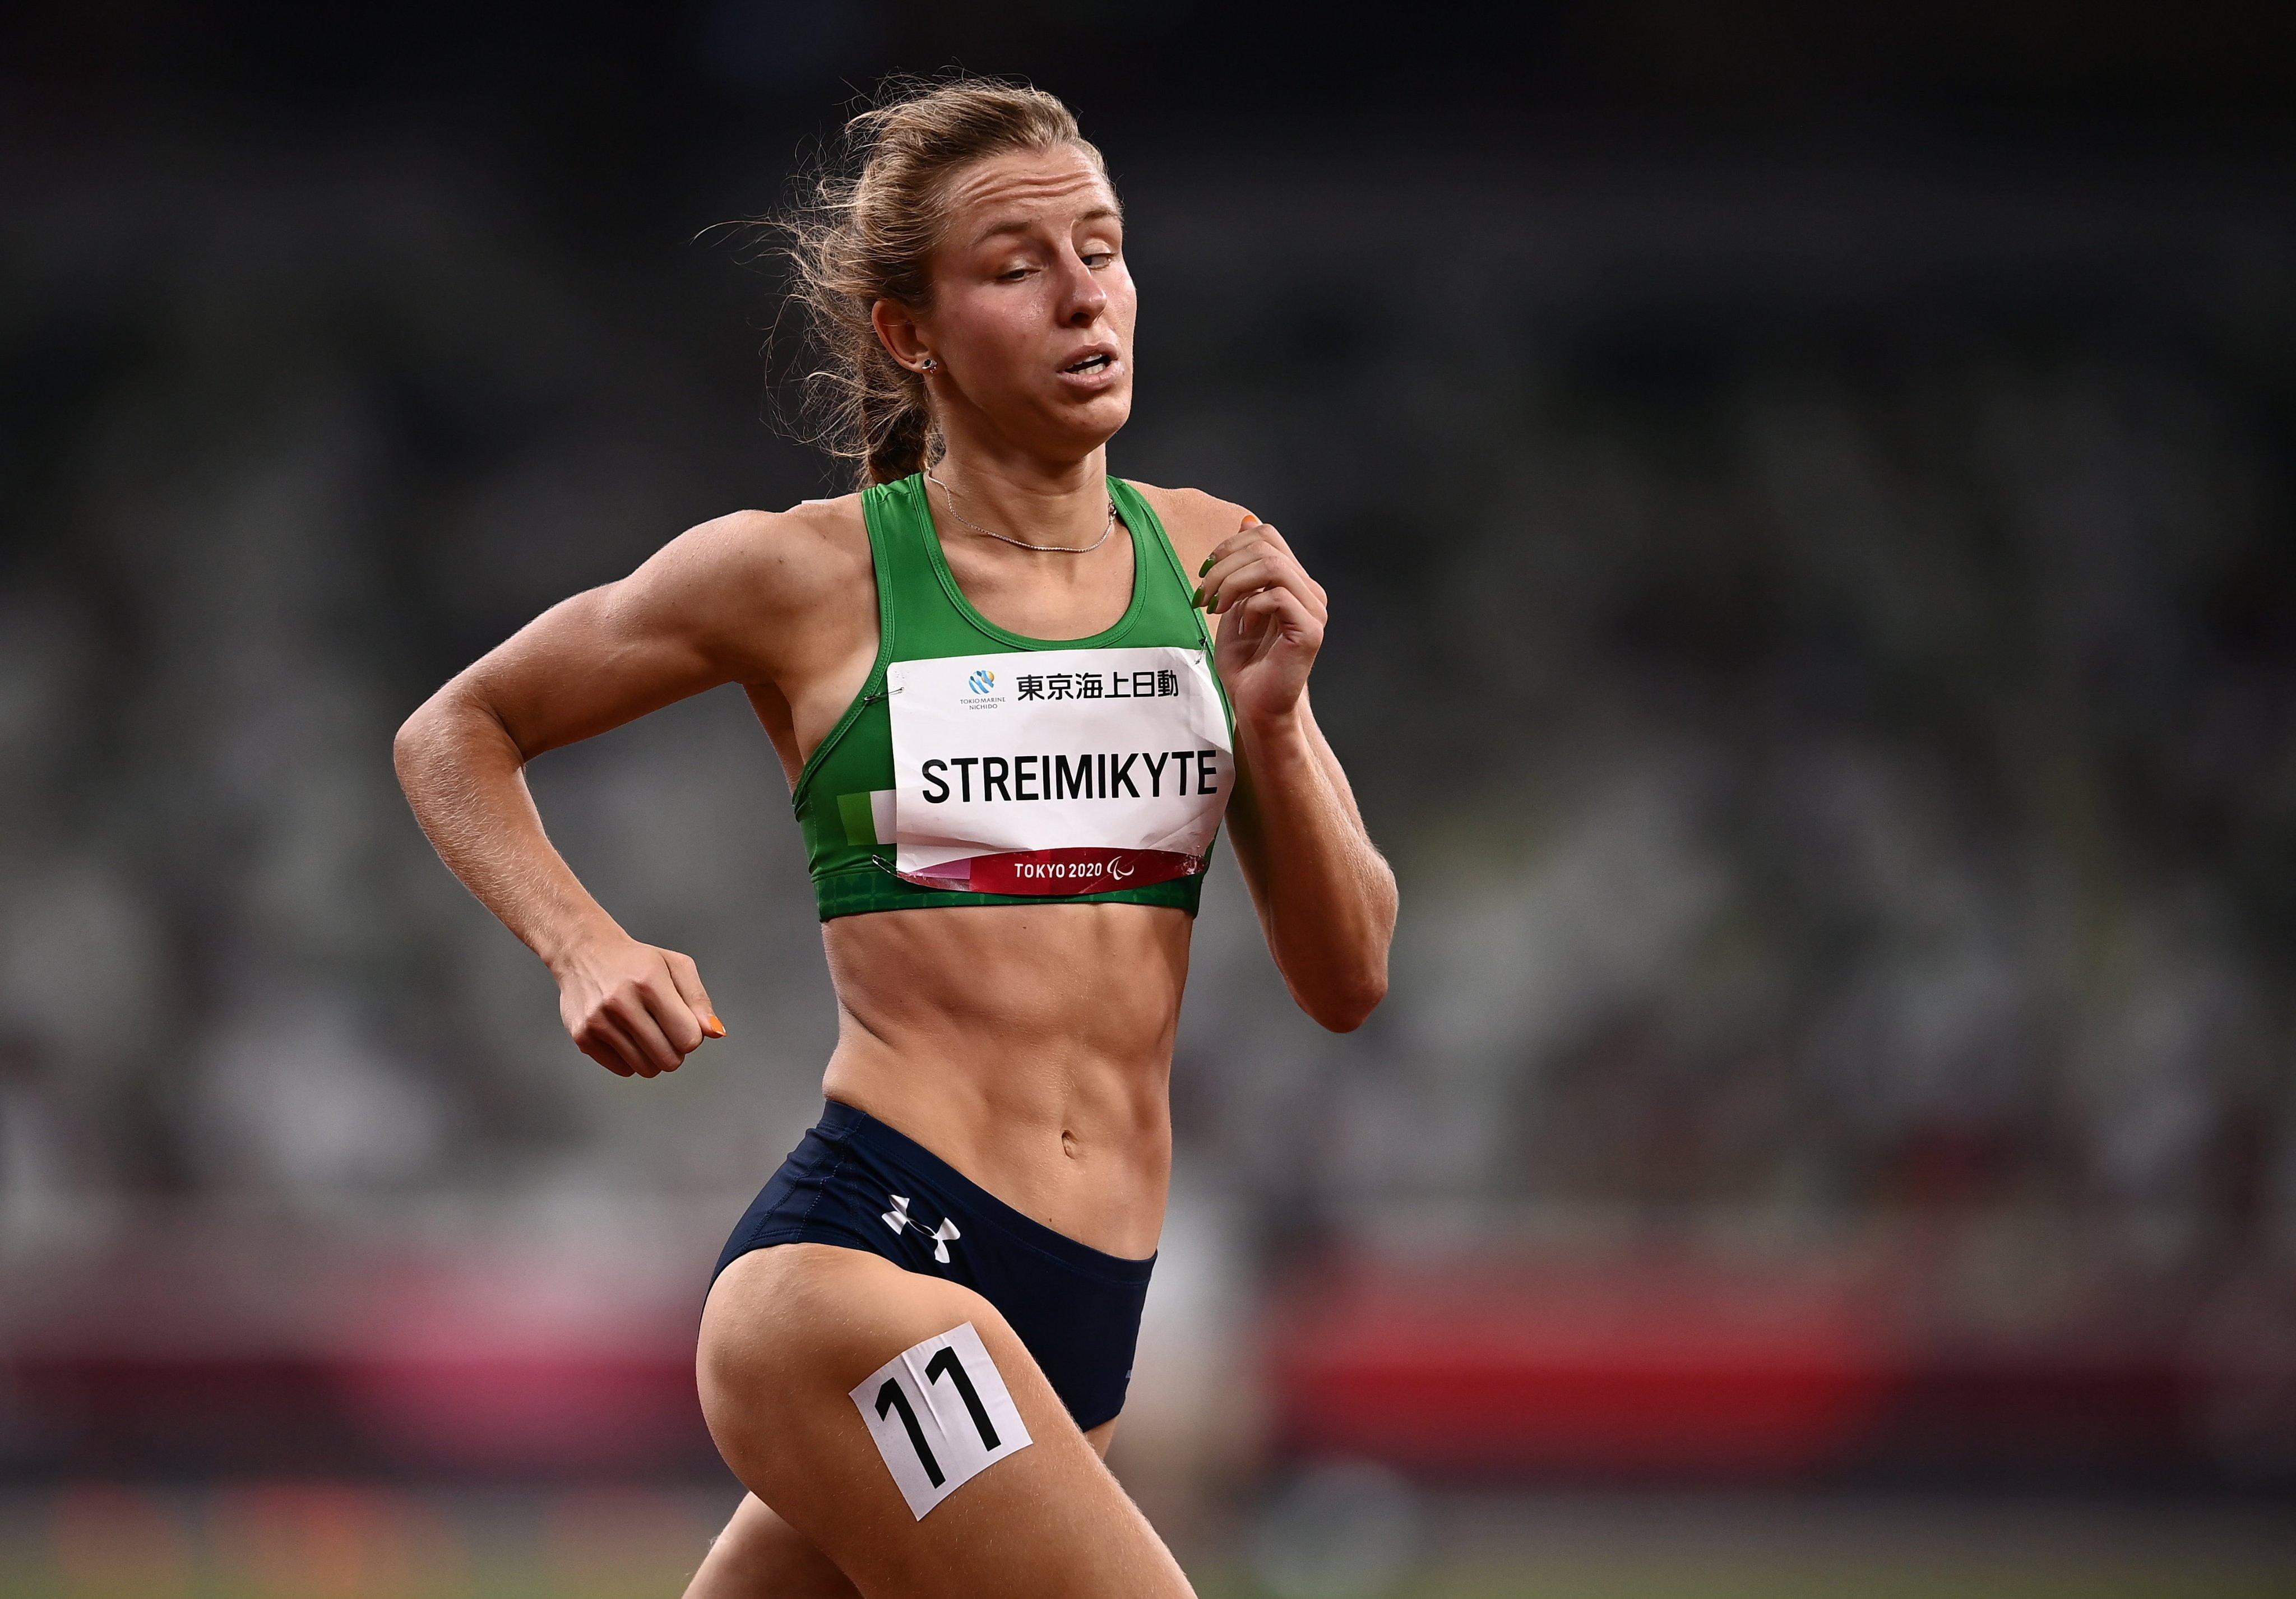 Streimikyte Battles to 5th Place Finish